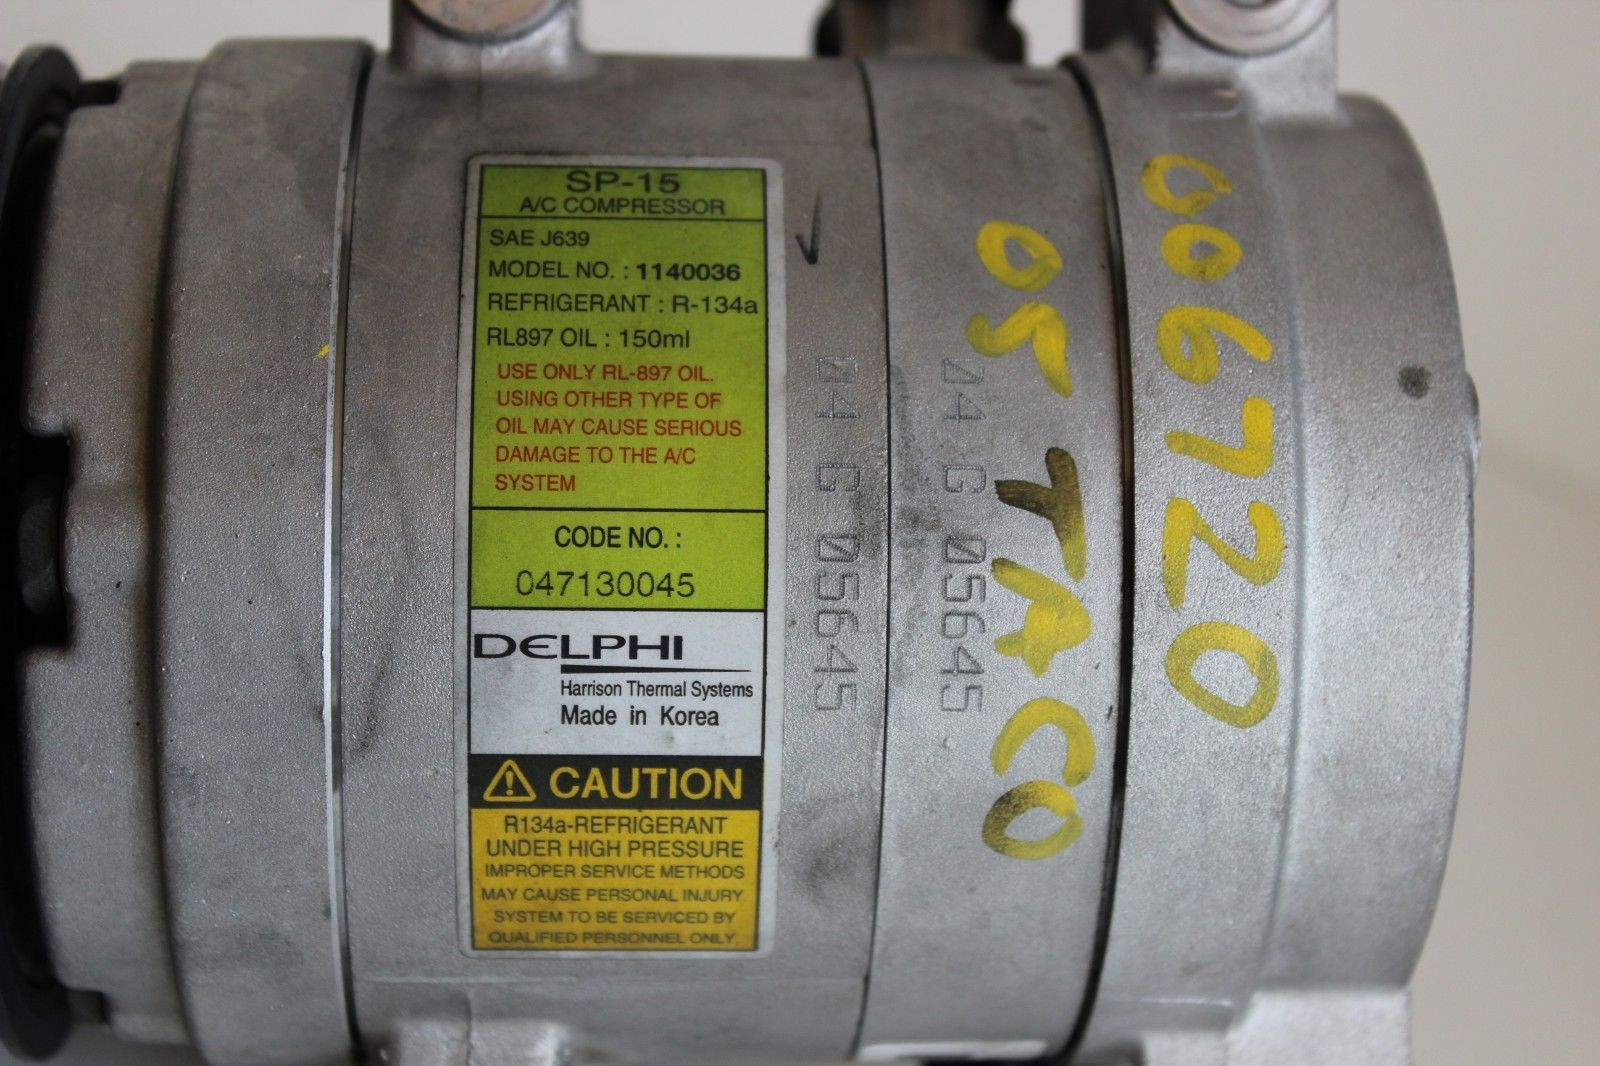 Toyota Highlander Service Manual: Cooler compressor ASSY (2AZ-FE)